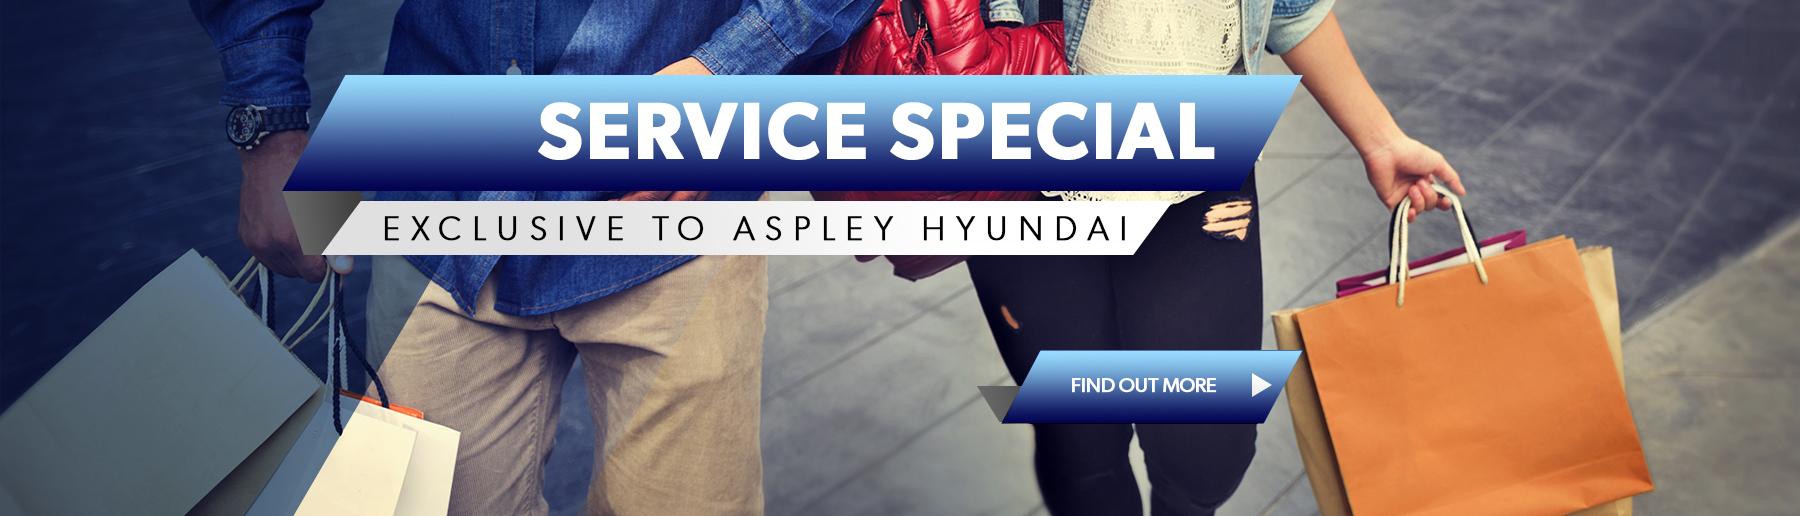 Brisbane Hyundai Service Special Gift Card